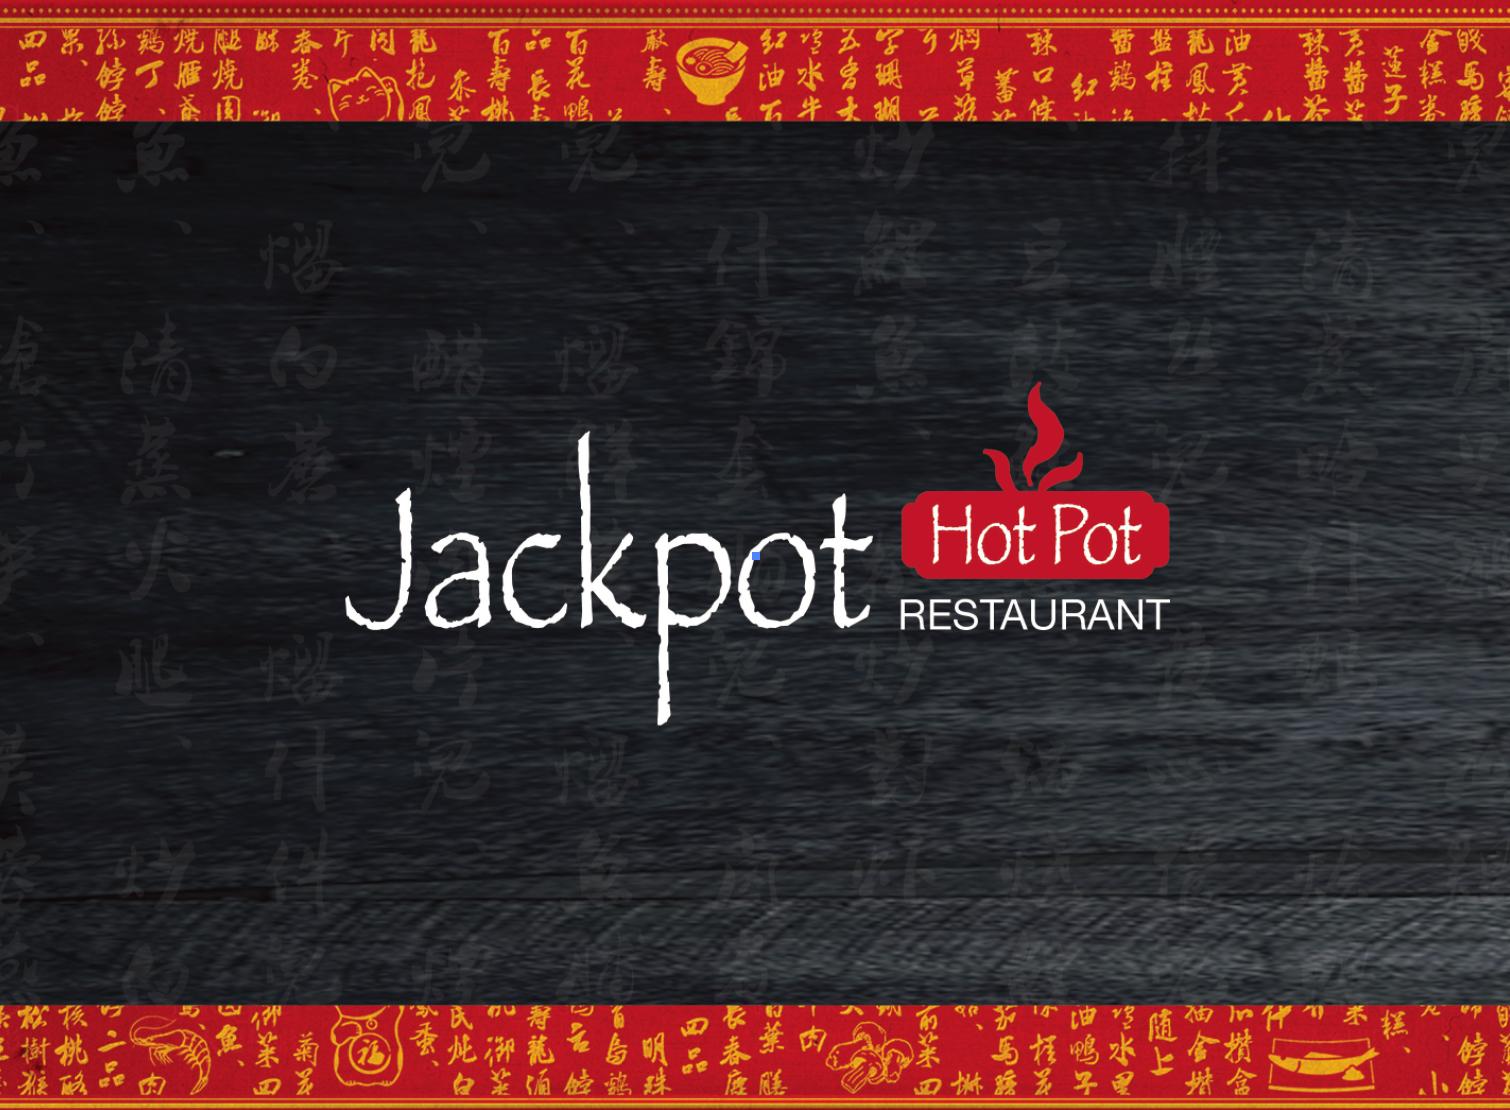 Jackpot Hot Pot